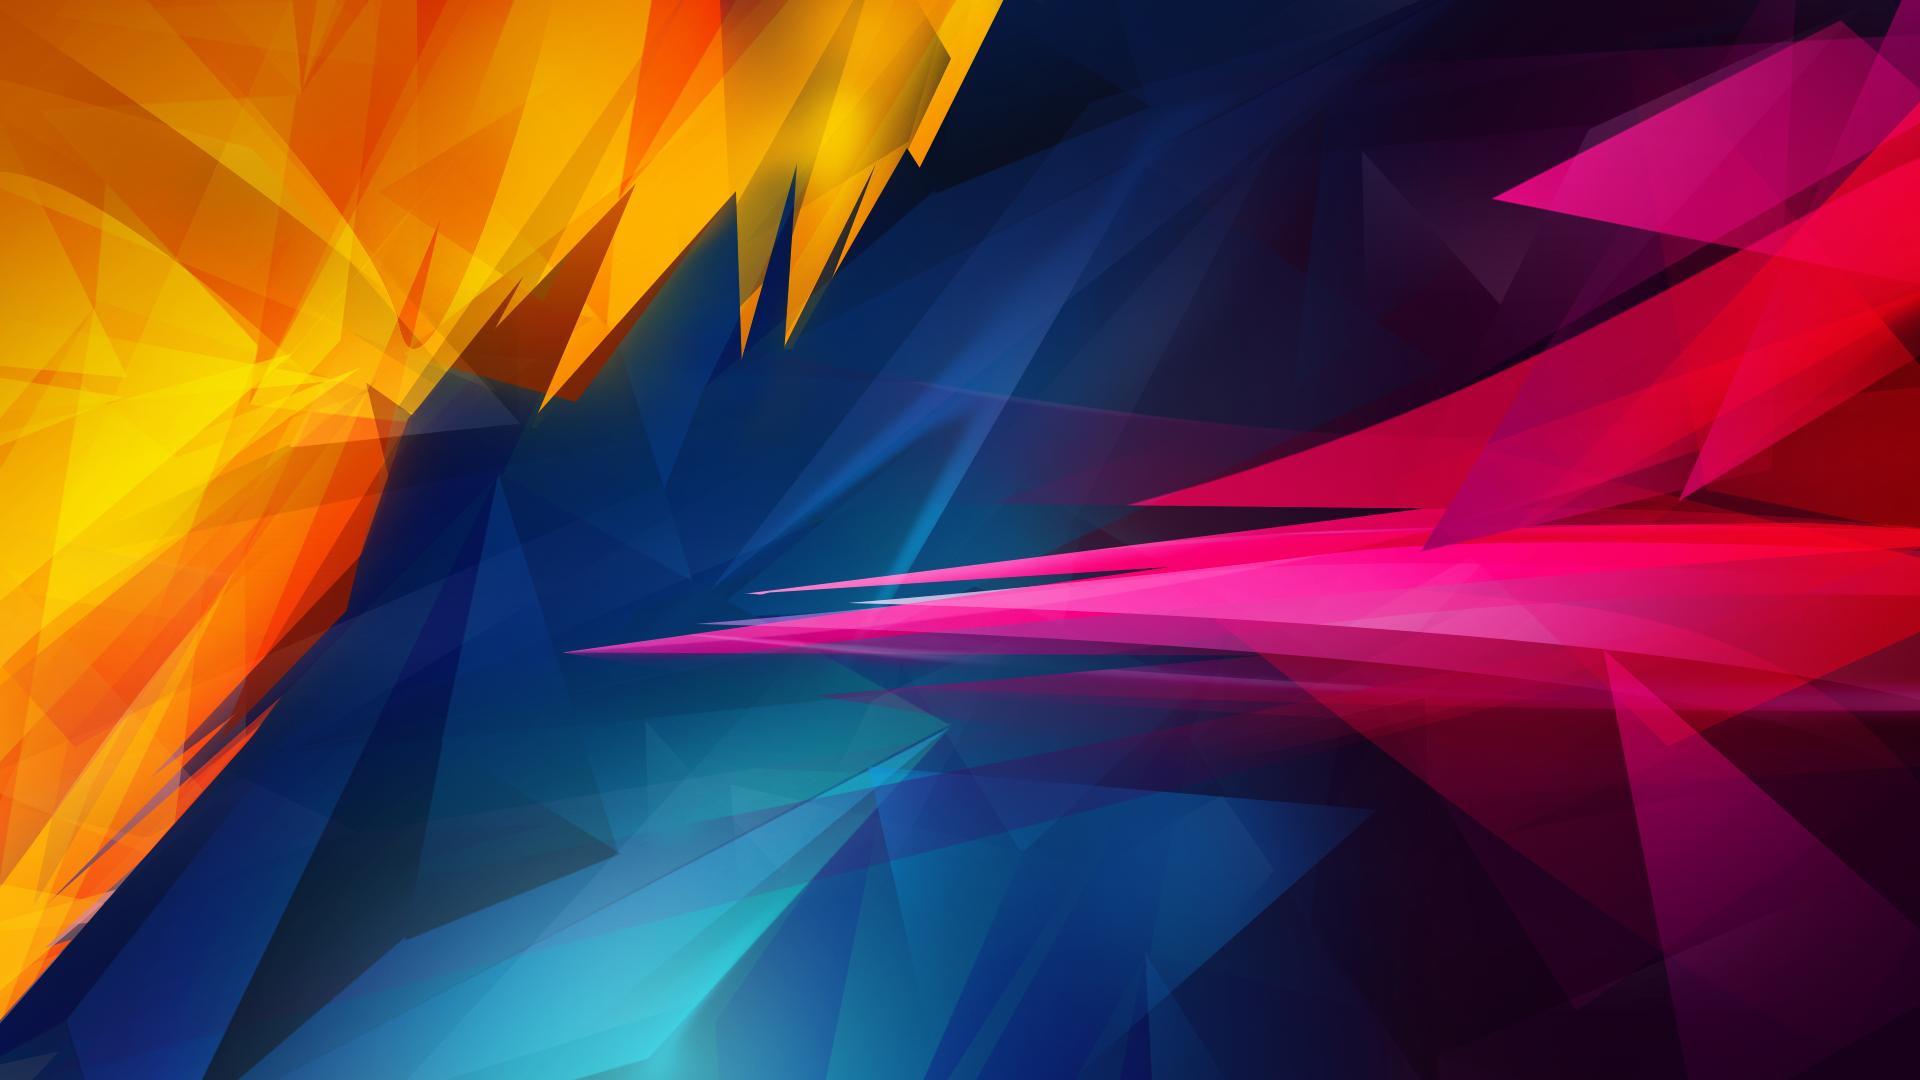 abstract wallpaper 1920x1080 39917